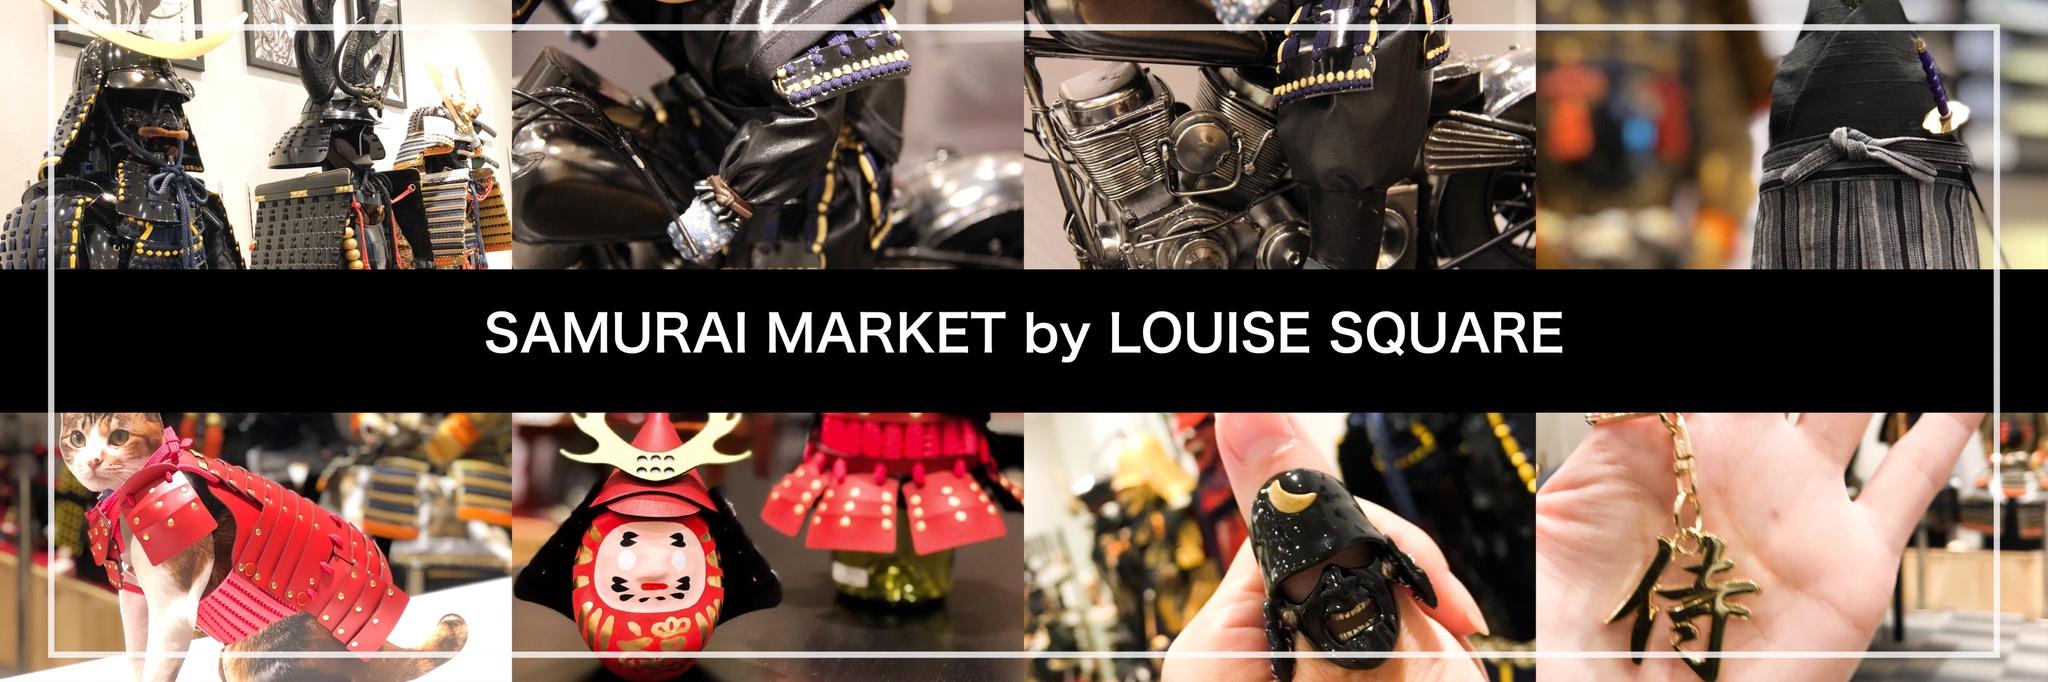 SAMURAI MARKET by LOUISE SQUARE